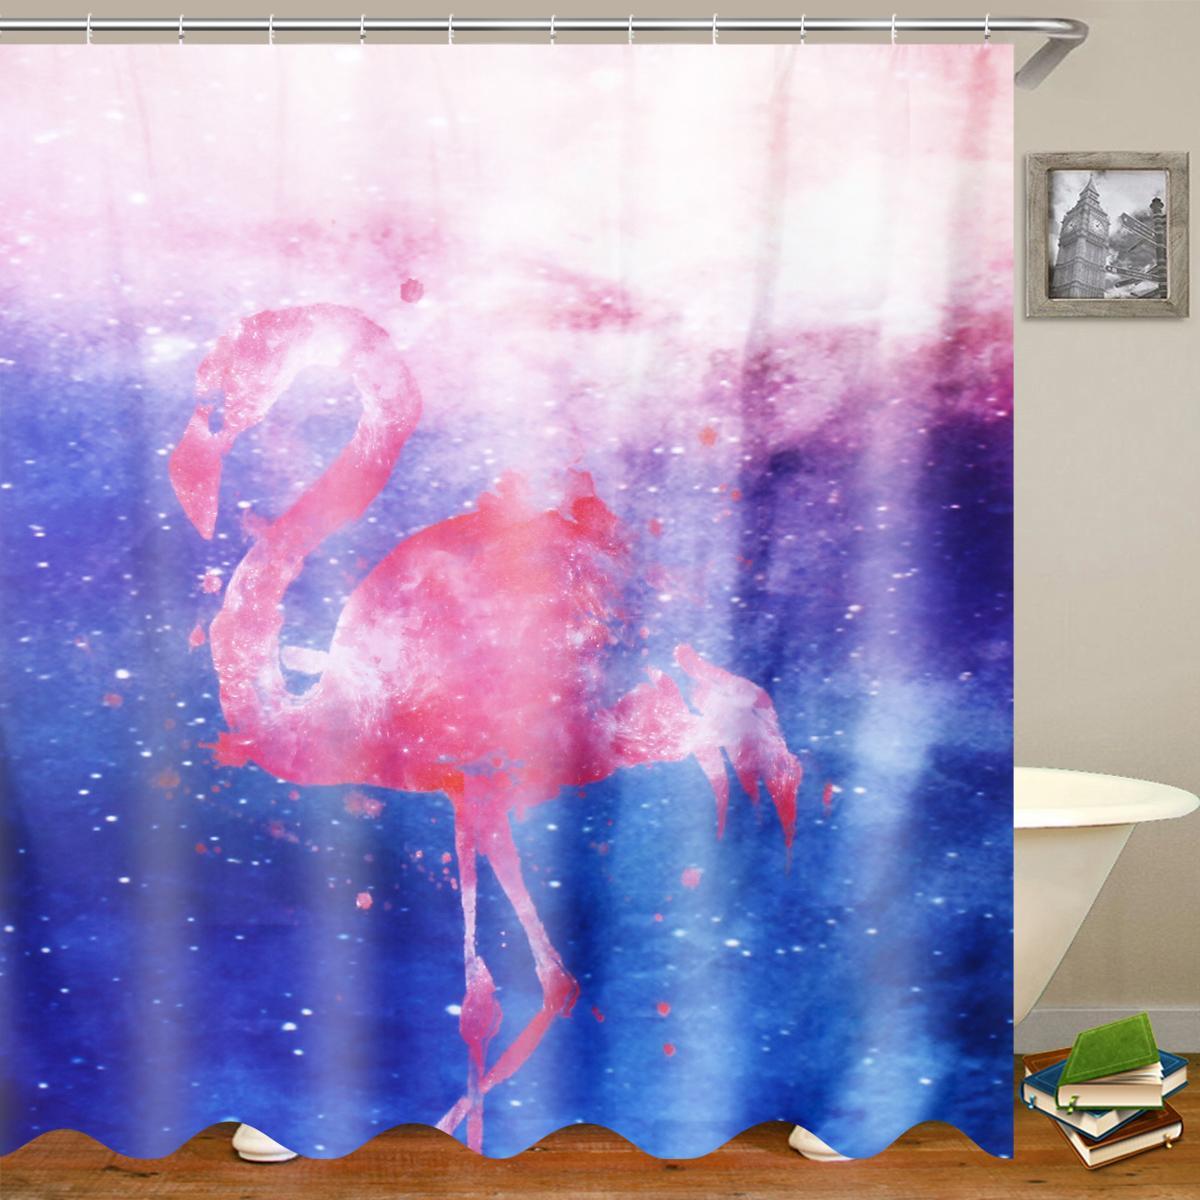 Anti Slip Bird Shower Curtain Set Free Punched Bathroom Door Curtain